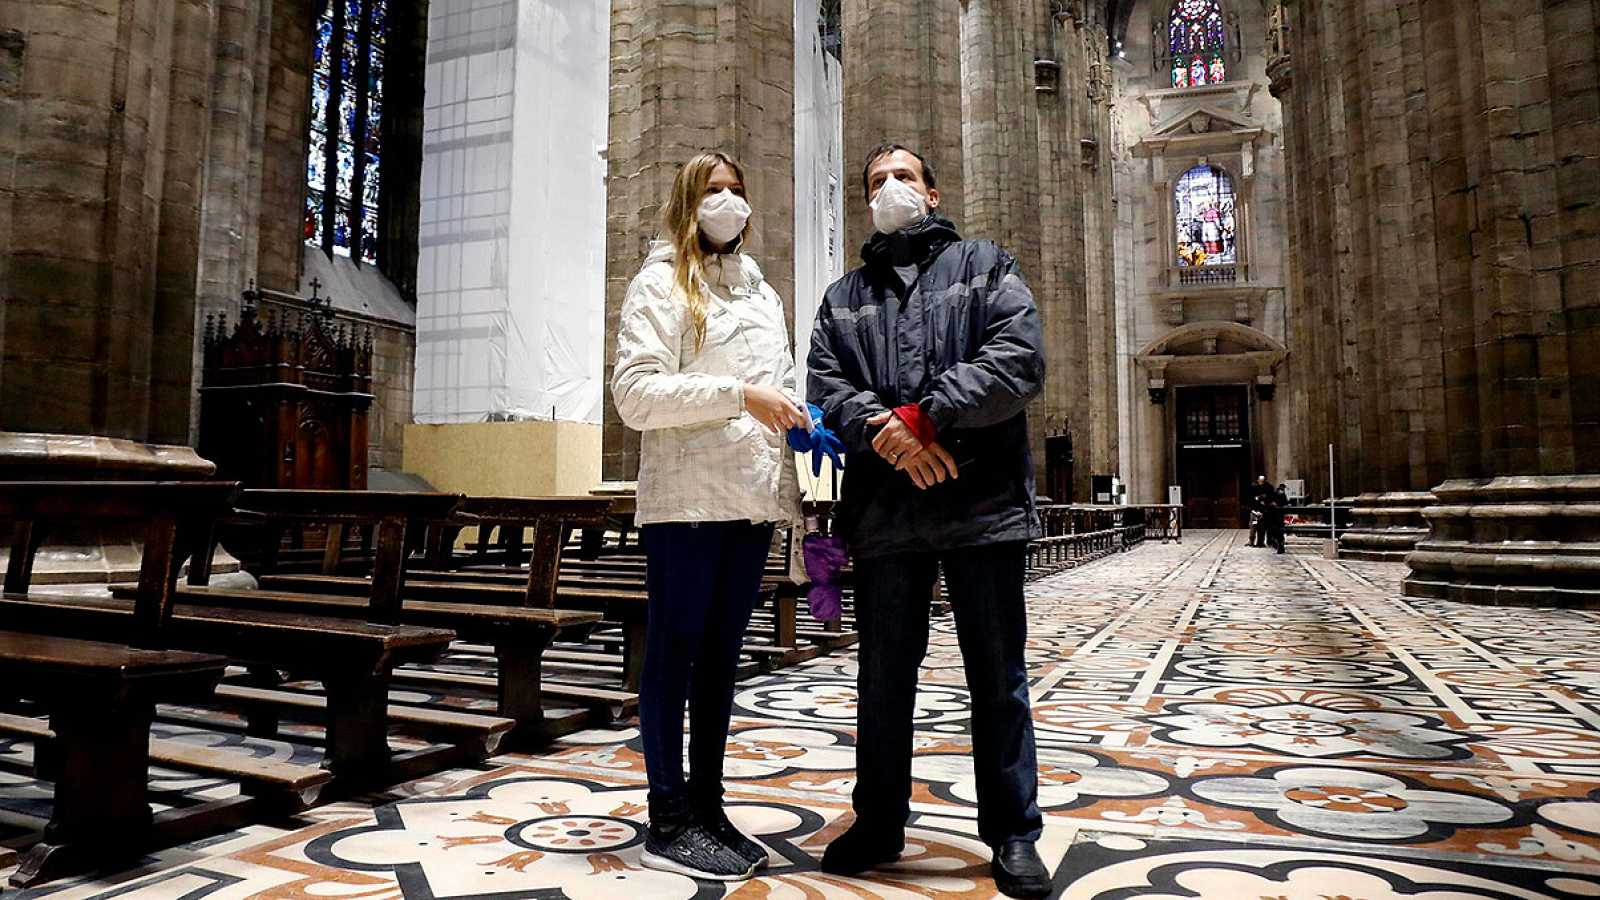 Turistas con mascarillas en la catedral de Milán. EFE/EPA/MOURAD BALTI TOUATI